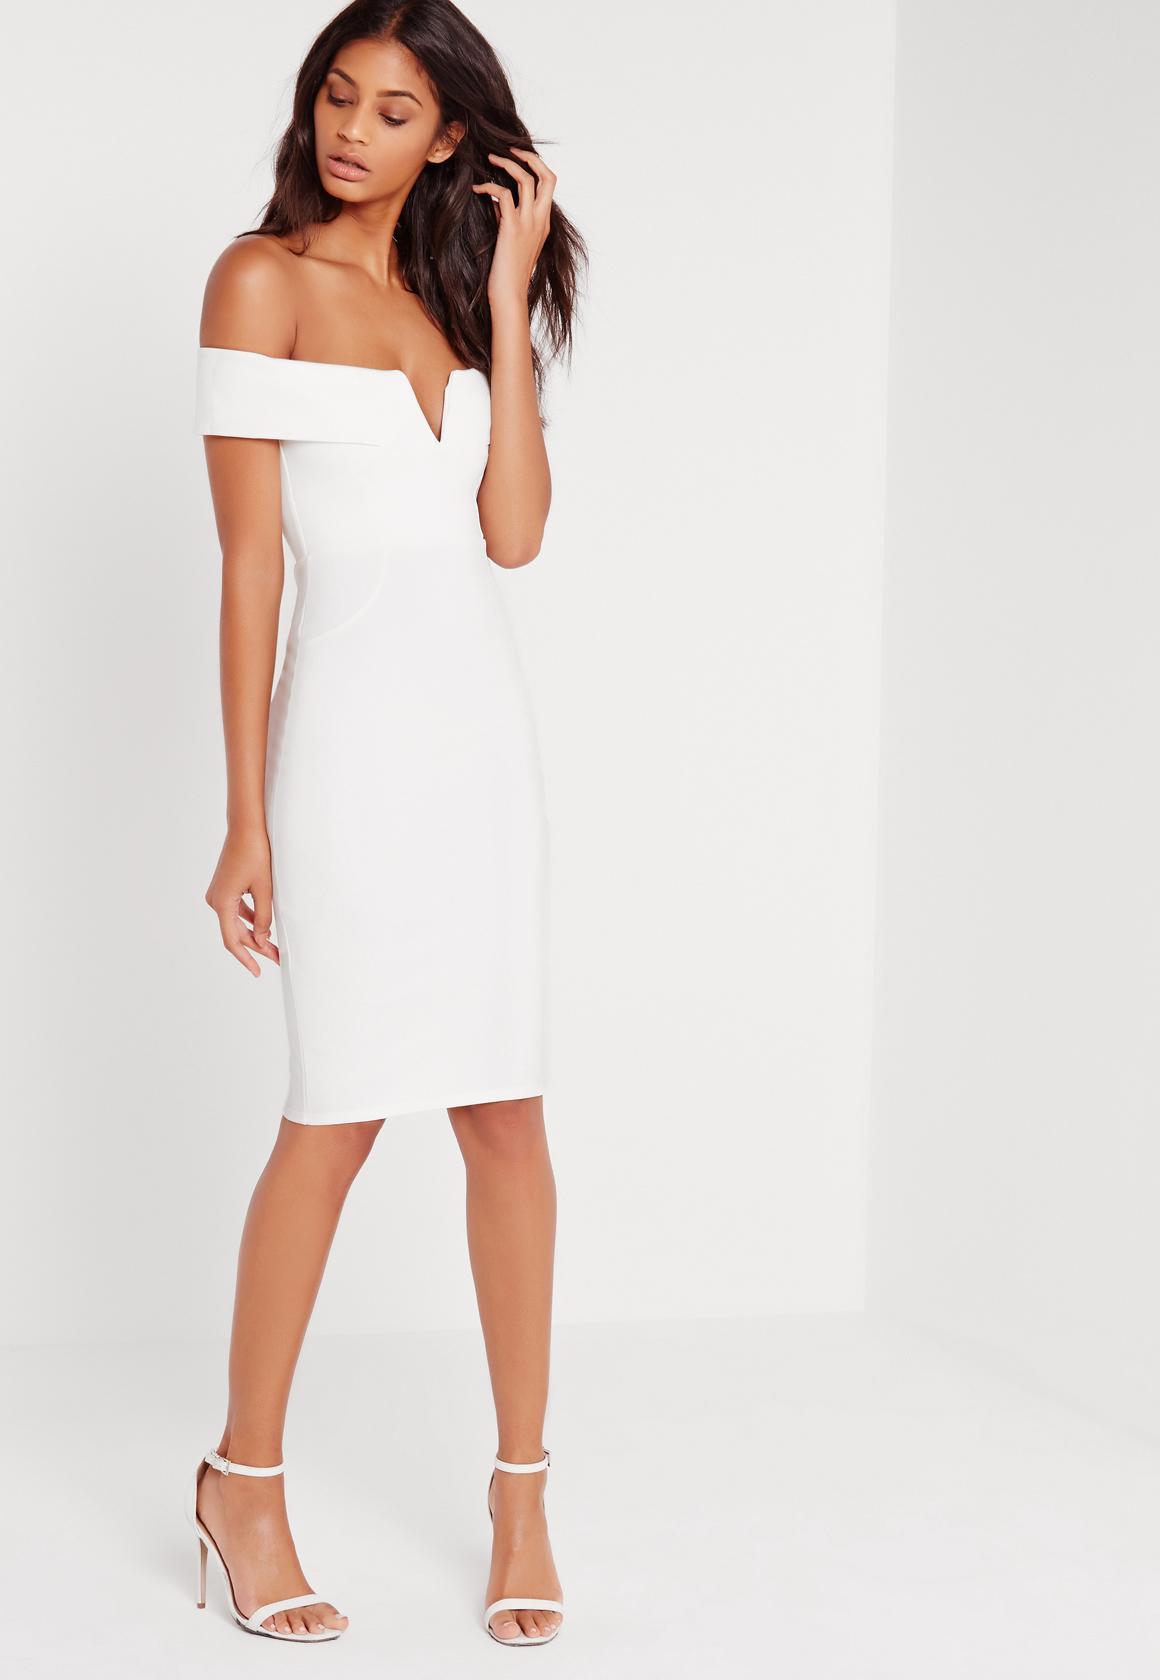 Kleider mit V-Ausschnitt & tiefem Ausschnitt - Missguided DE